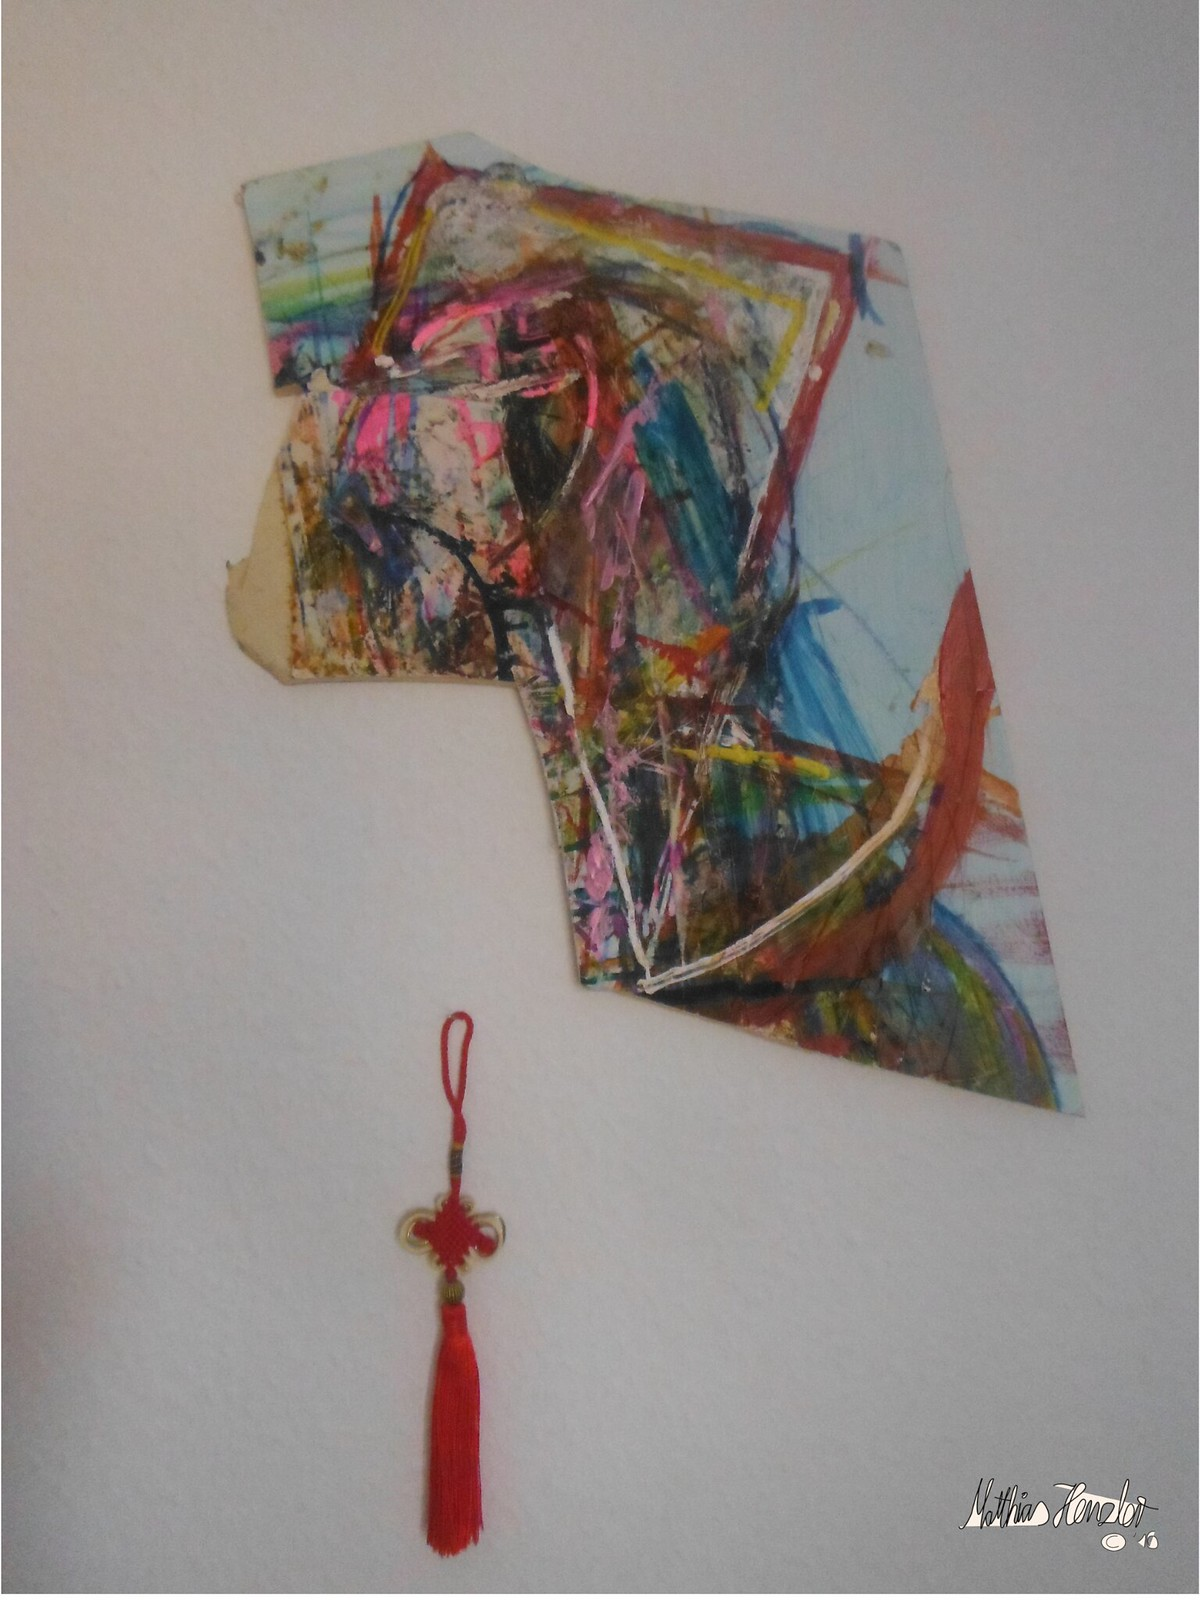 Glücks-, Vogel-, nahe, nähren | matthiashenzler.de | malerei